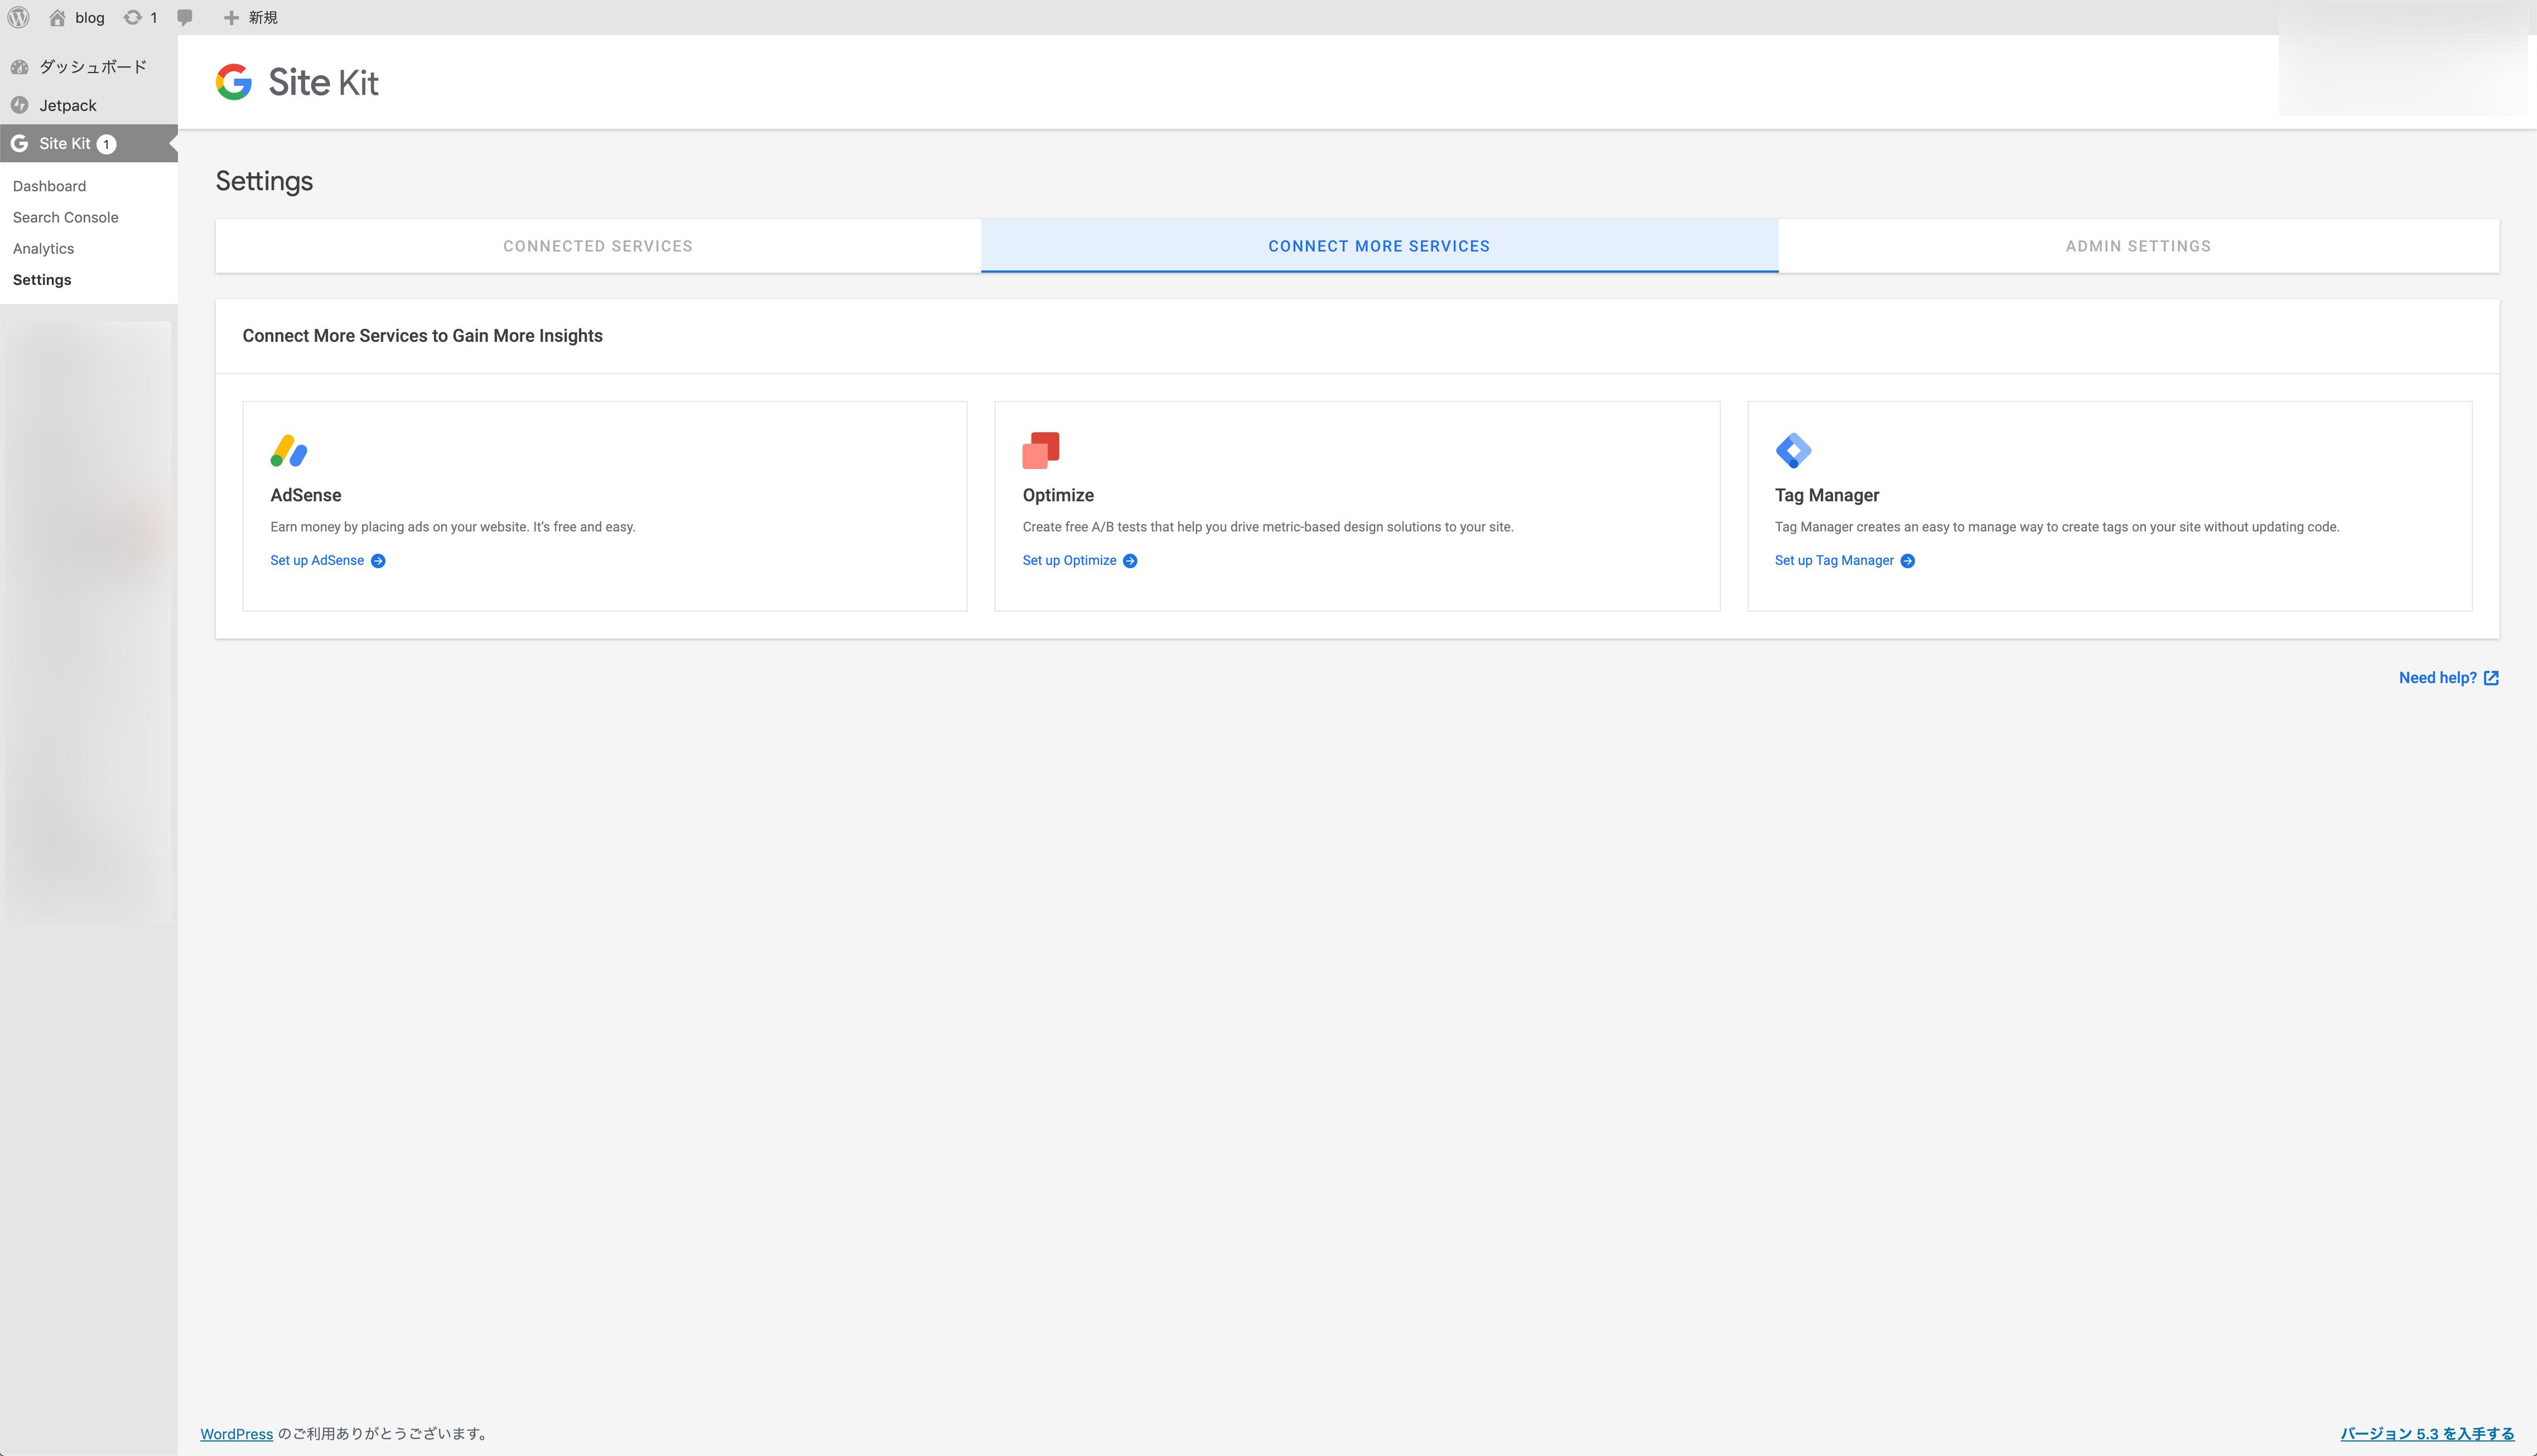 WordPress プラグイン Site Kit by Google のインストール方法